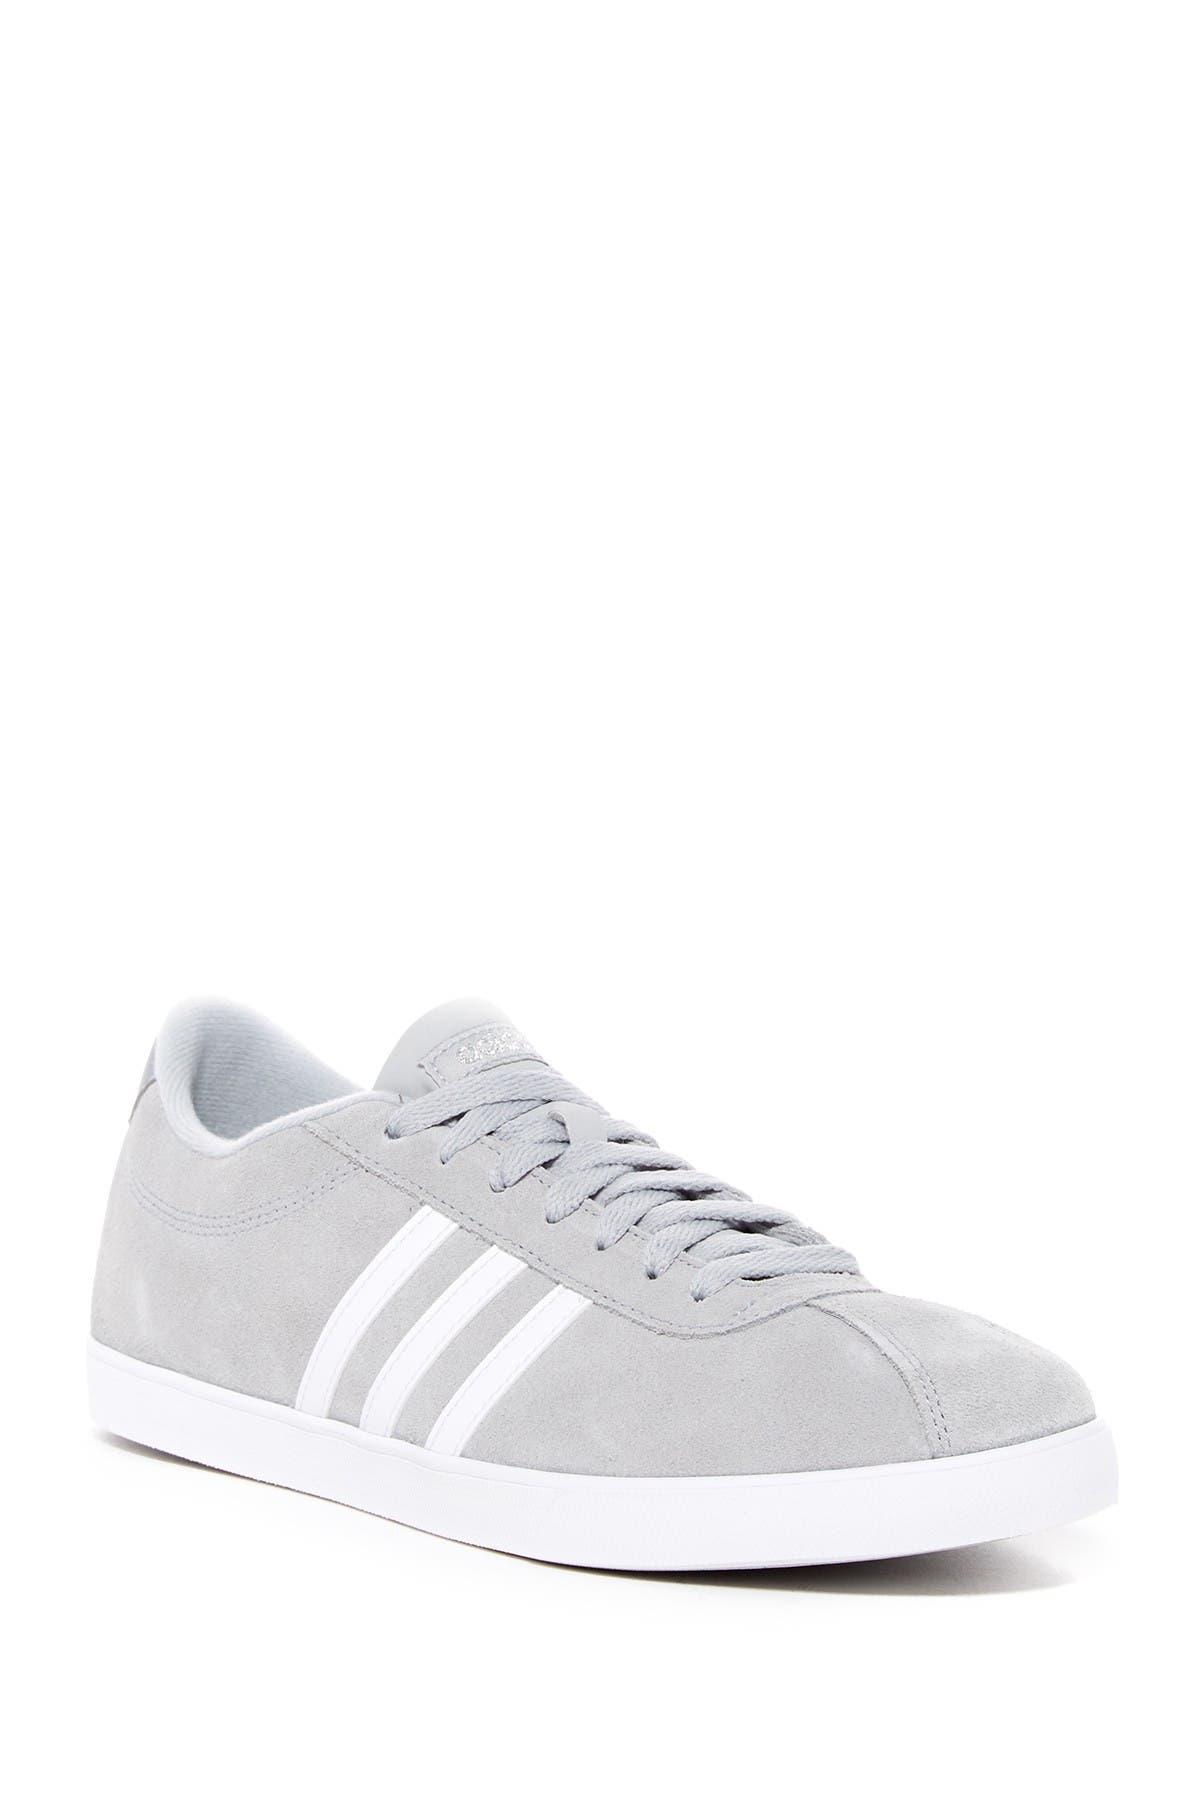 Image of adidas Courtset Sneaker